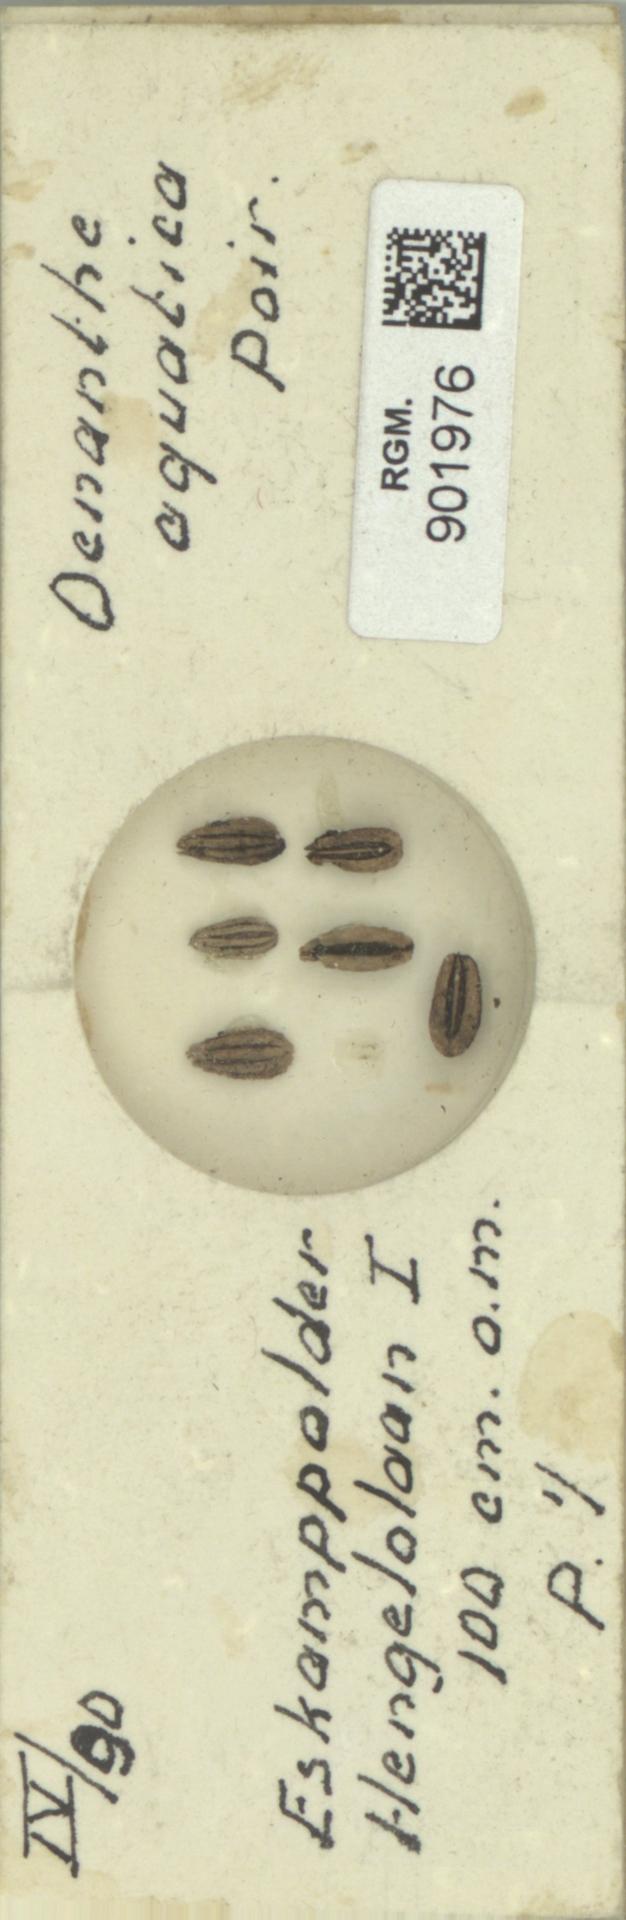 RGM.901976 | Oenanthe aquatica Poir